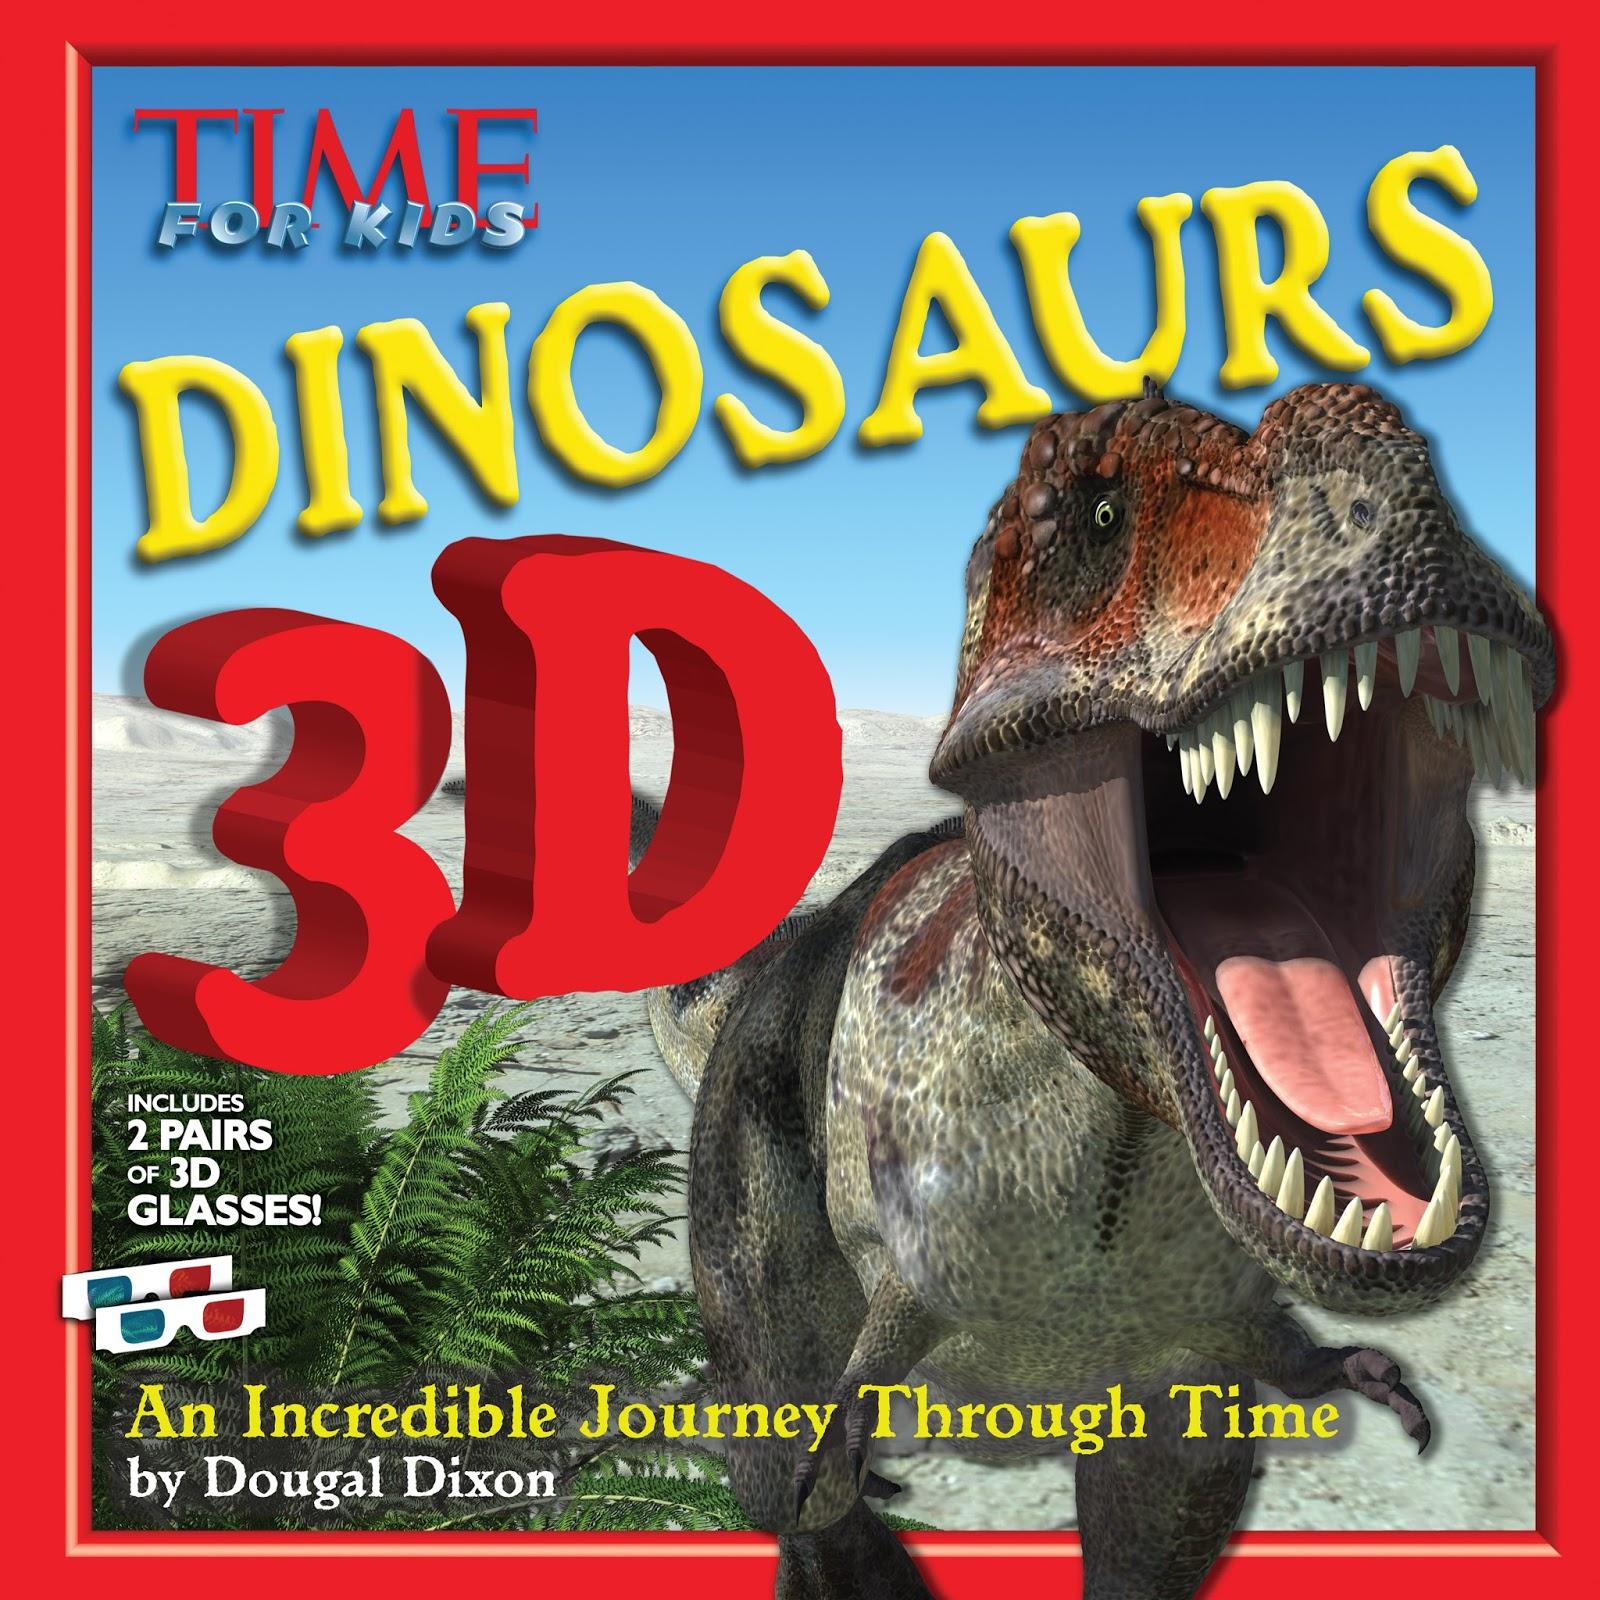 Dino+3D+Cover+Image.jpg